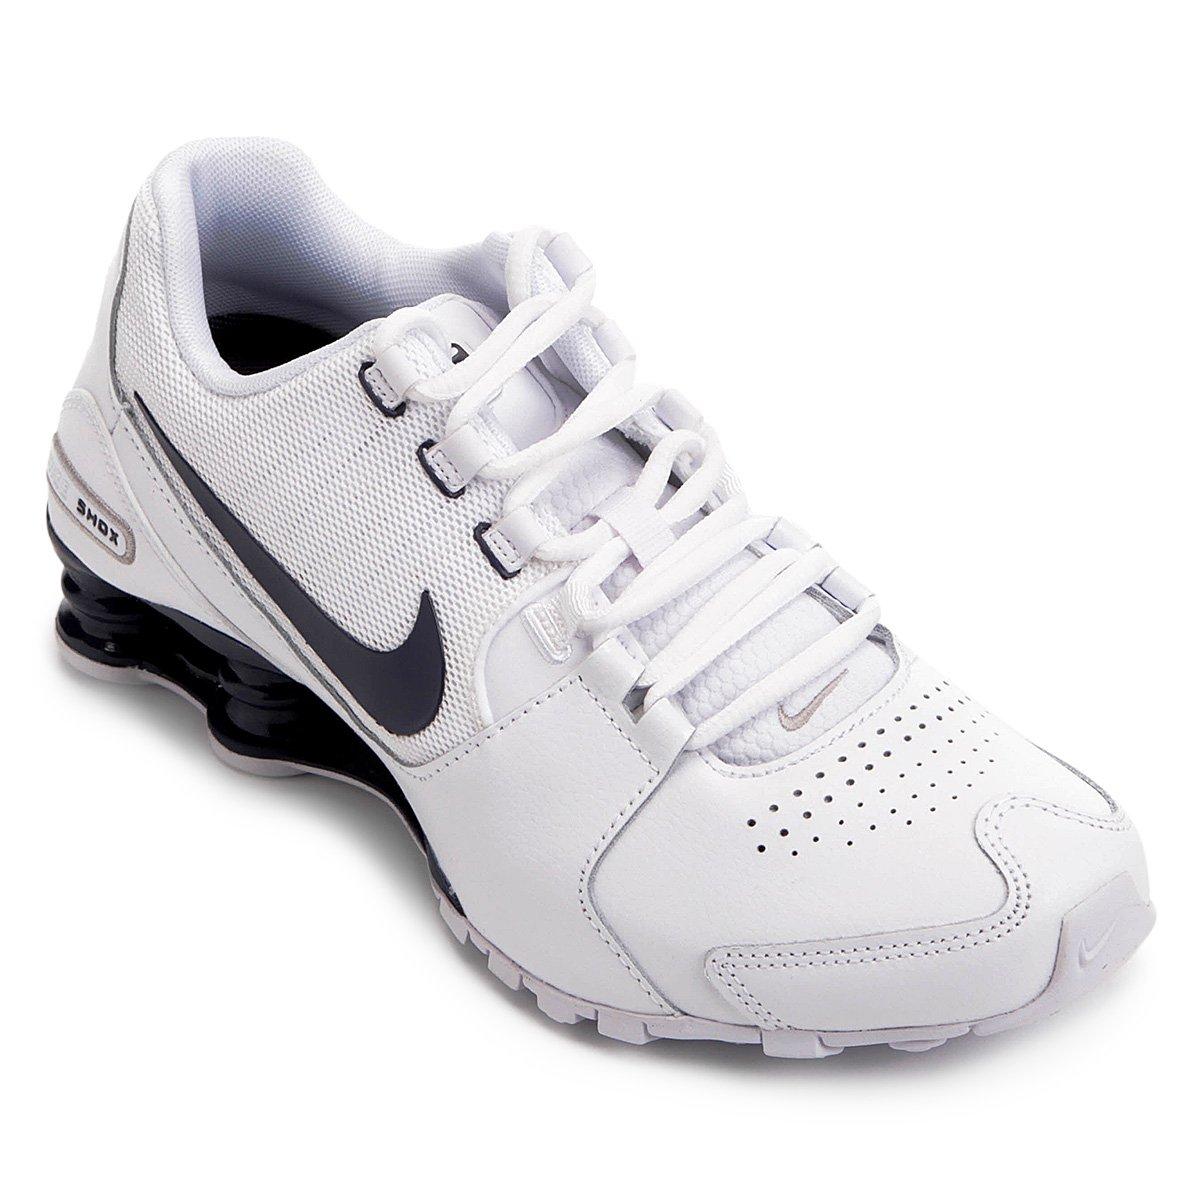 83330ea03a036 Tênis Masculino Nike Shox Avenue LTR 833584-104 - Branco Marinho ...